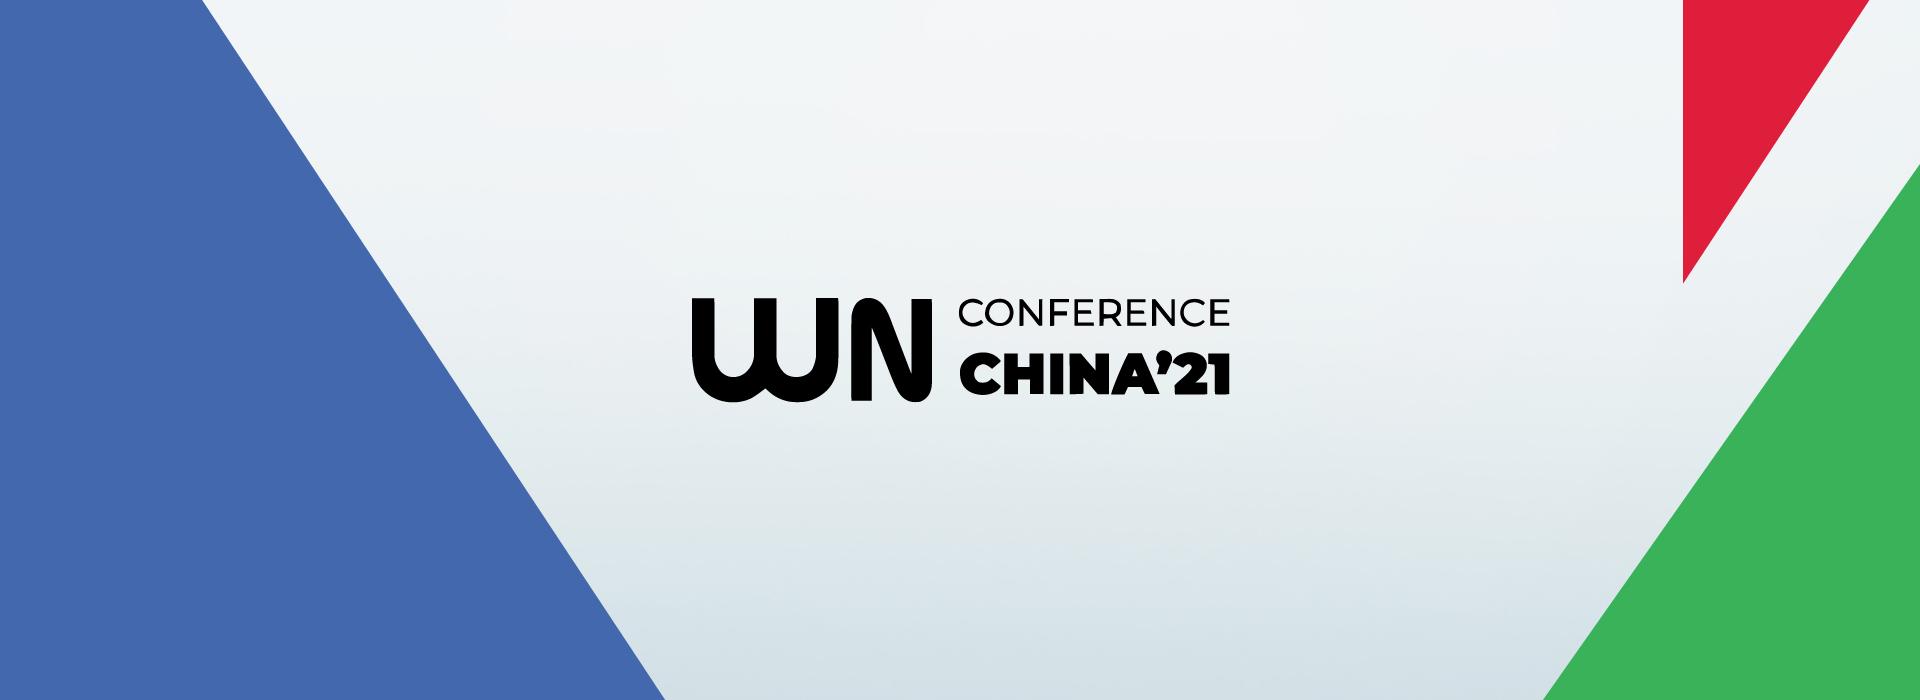 WN Conference China'21 - The Gaming Industry: MENA & China